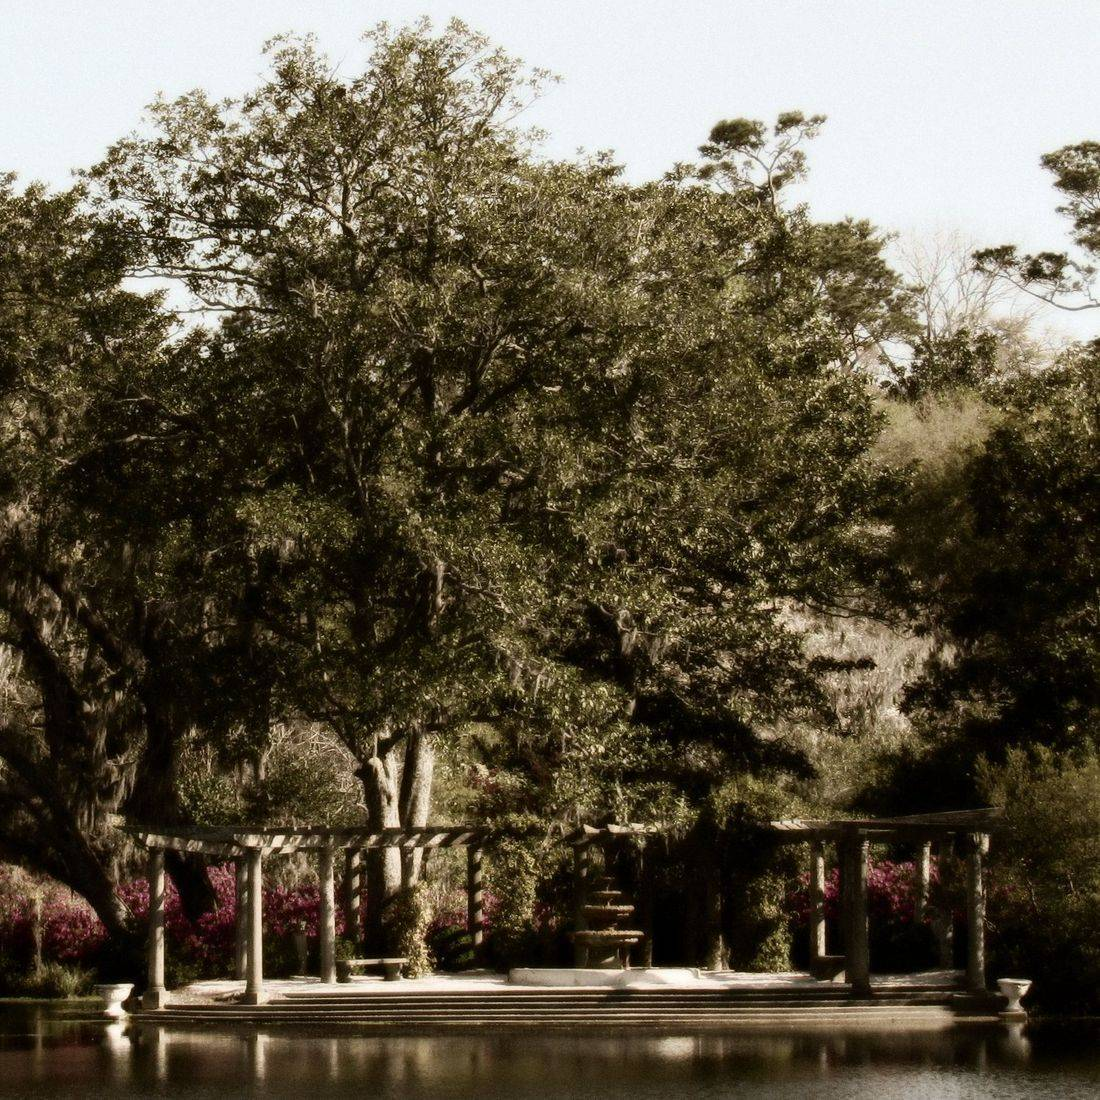 Gardens, Lake, Flowers, Trees, Garden, Pergola, Fountain, Water